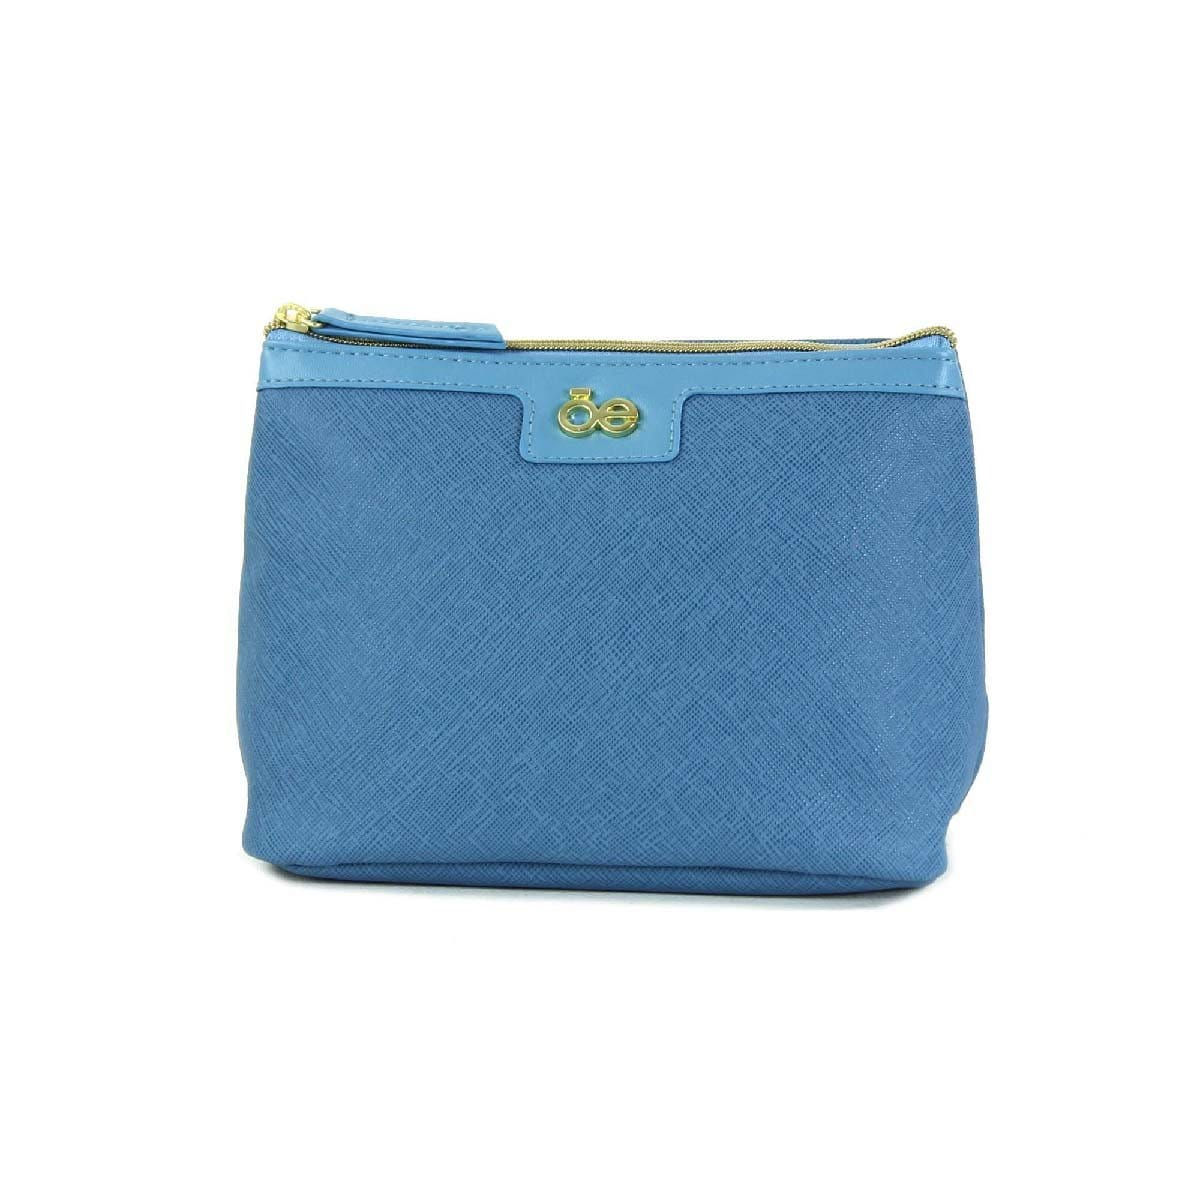 Cosmetiquera Safiano Azul Celeste Cloe